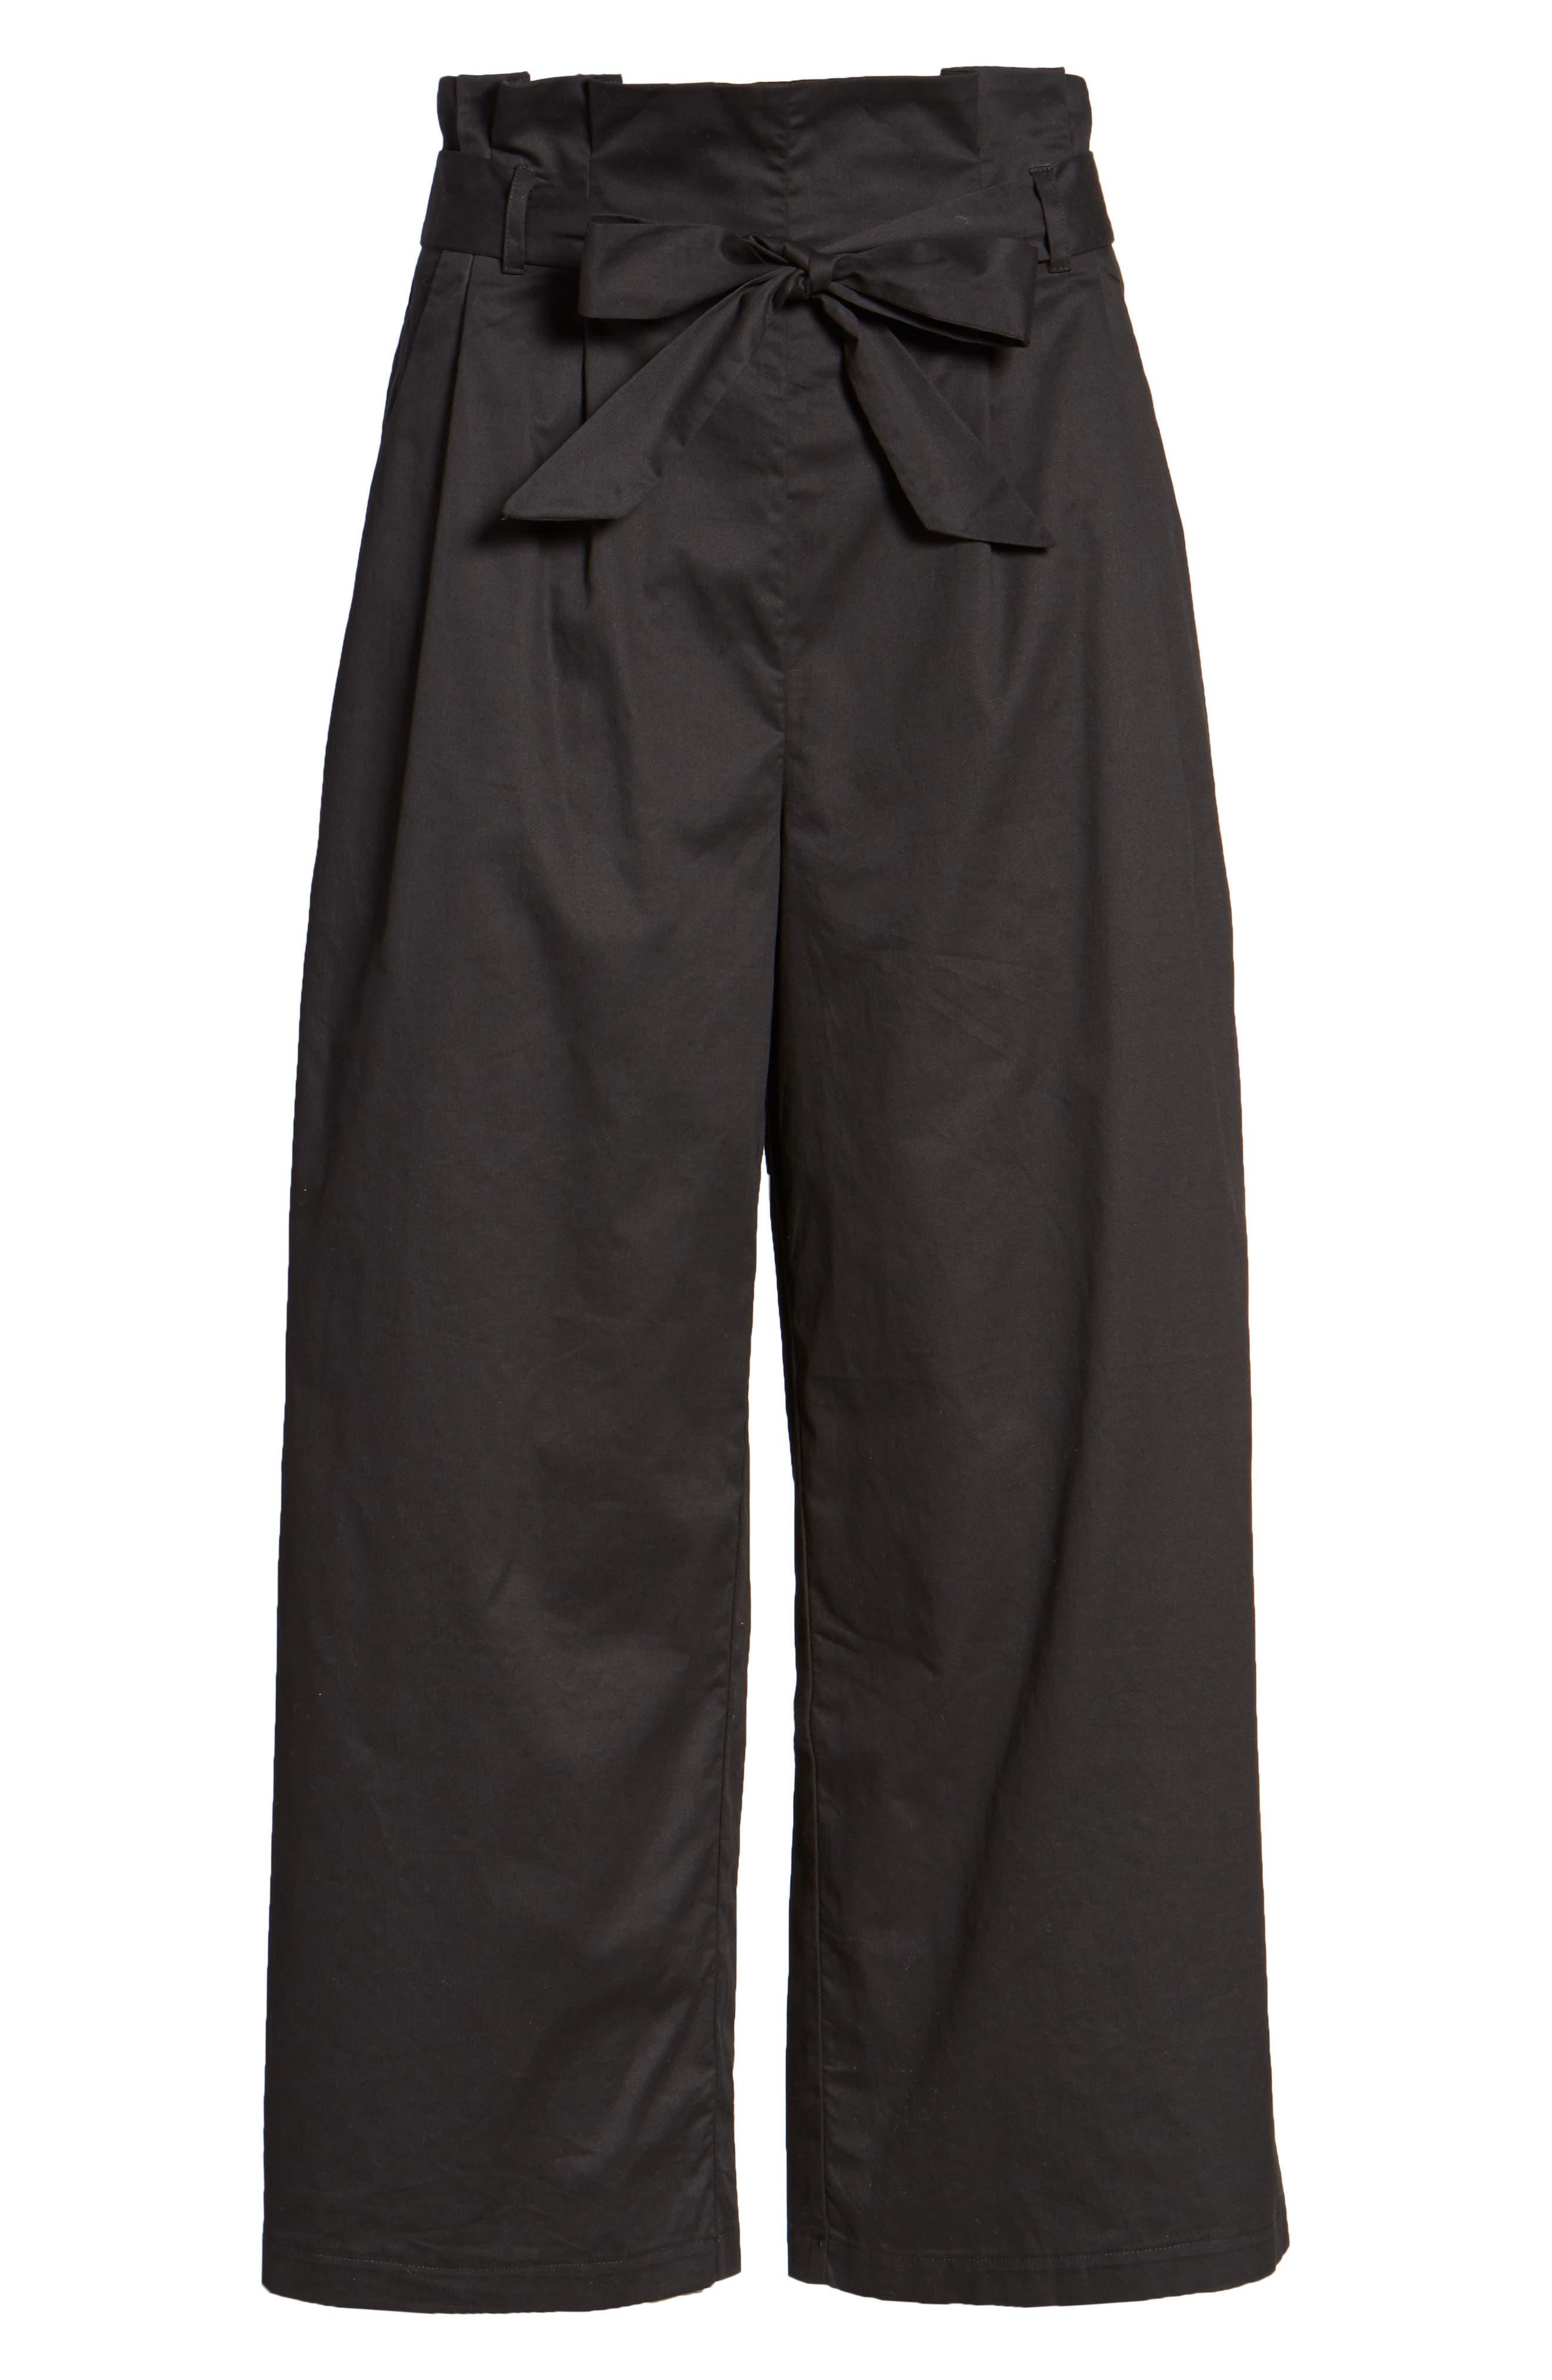 SOPRANO,                             Paperbag Waist Wide Leg Pants,                             Alternate thumbnail 6, color,                             001